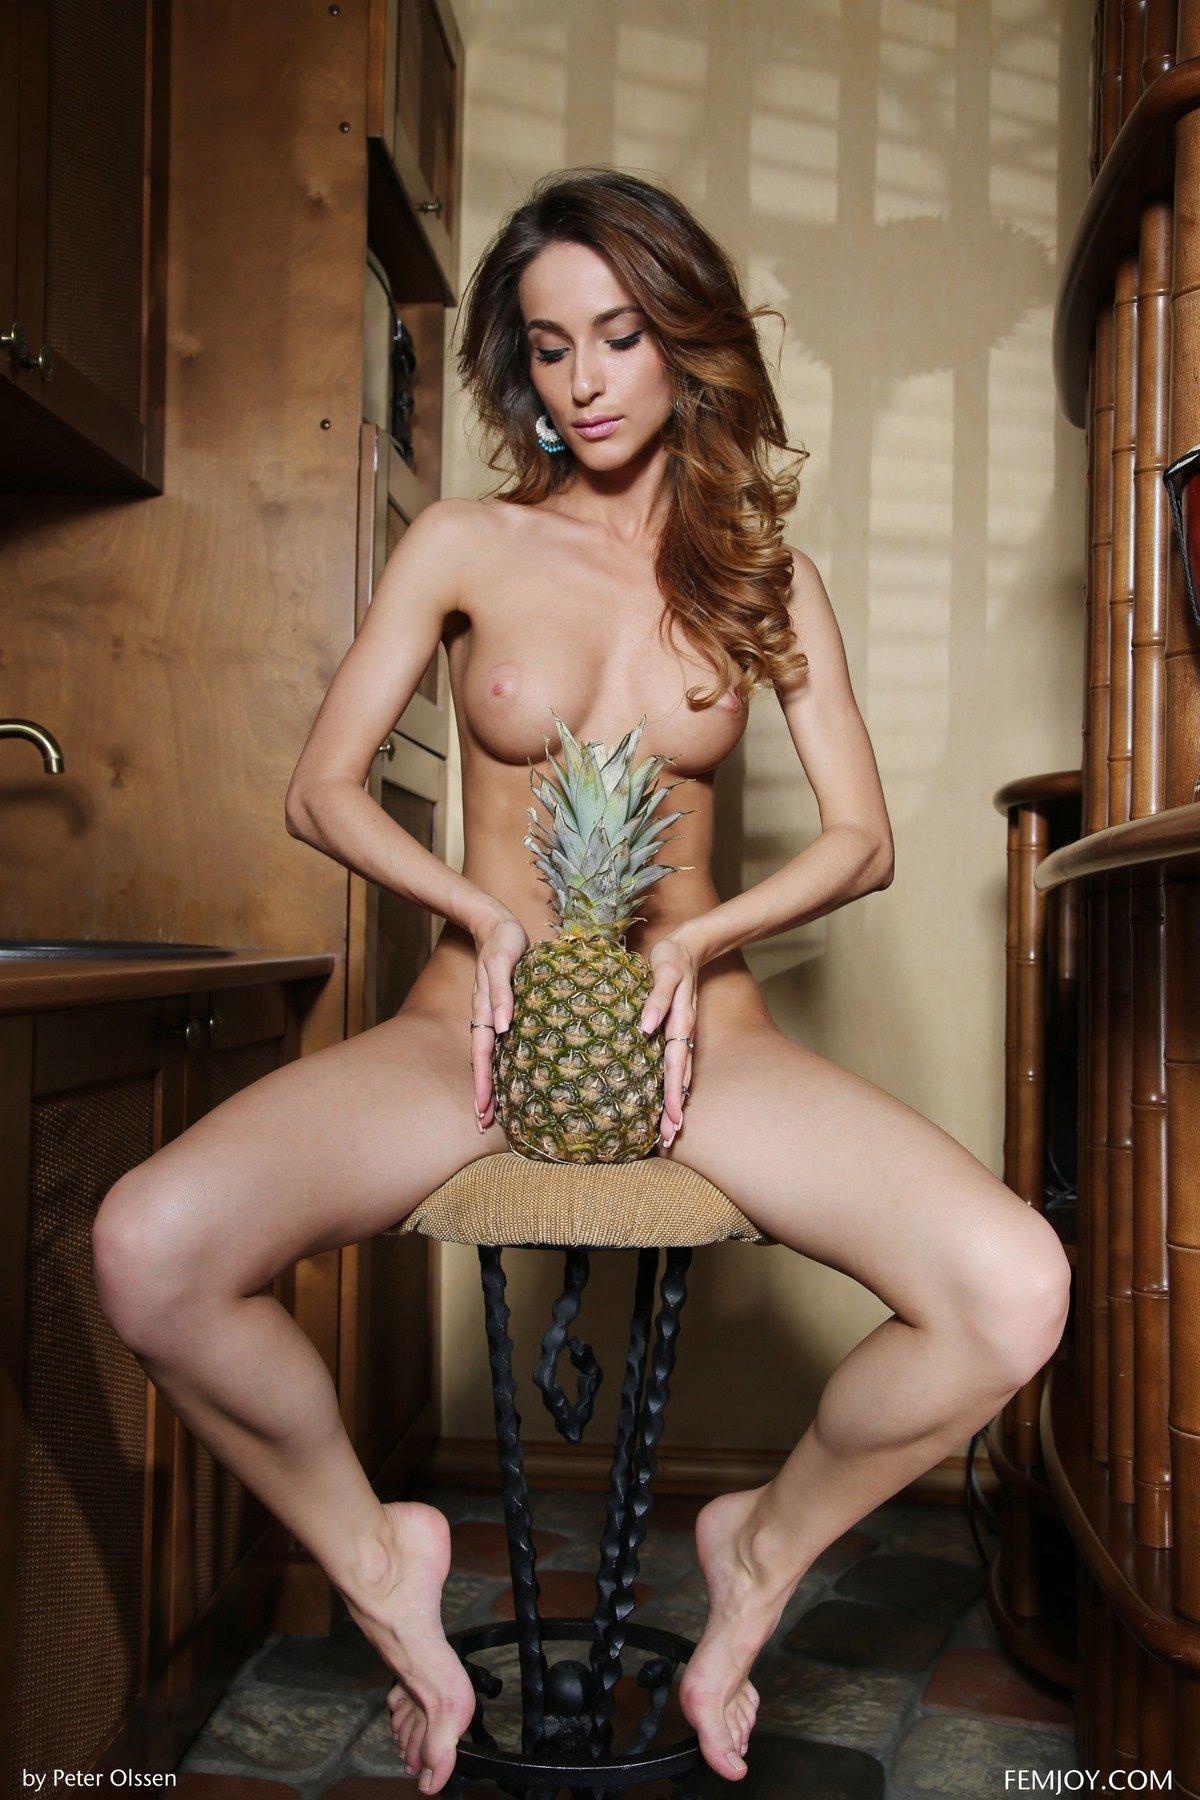 Обнаженная шатенка с ананасом